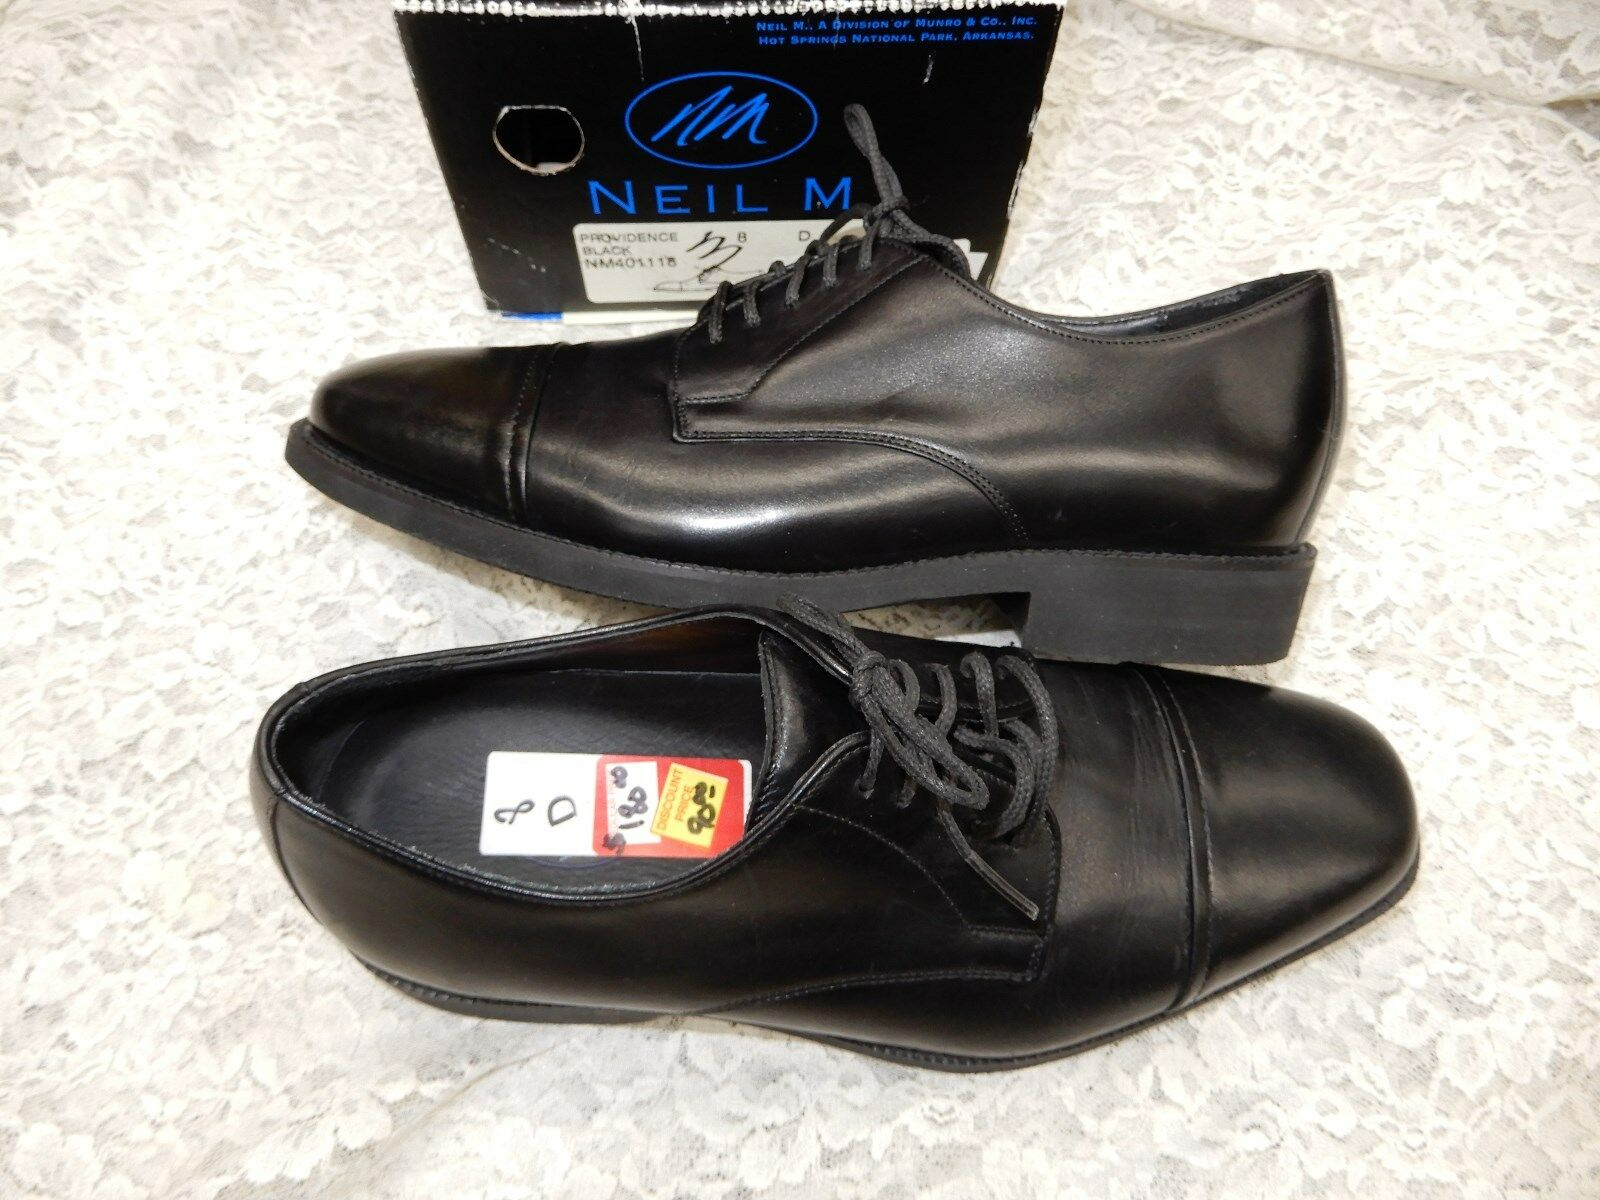 NEIL M. 8 D black leather oxford shoes  180 retail Men's shoes Providence